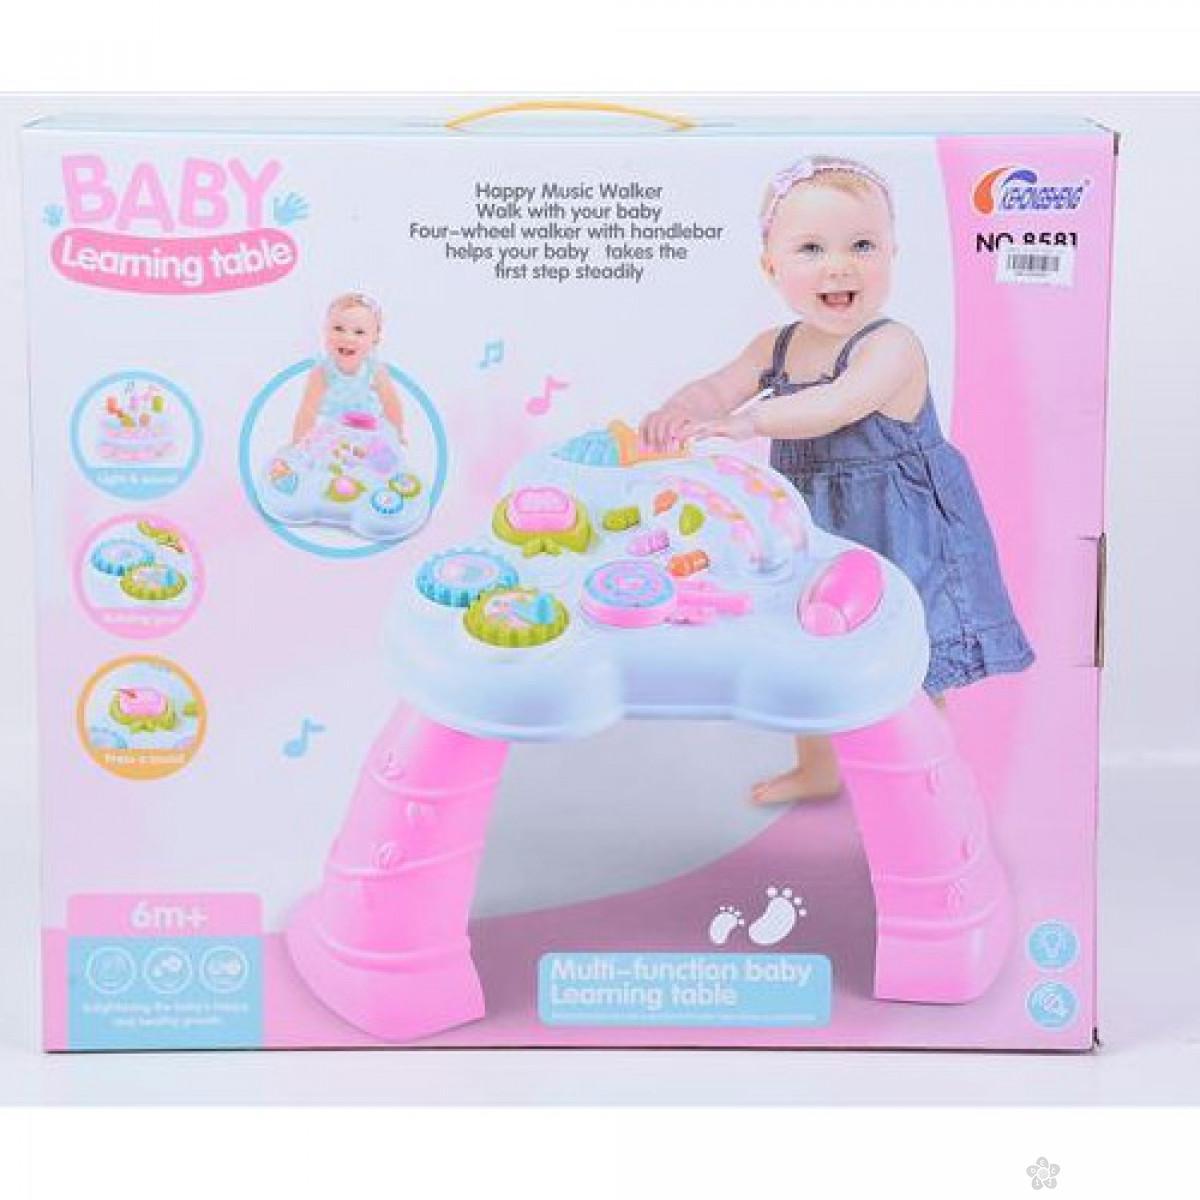 Muzički sto za bebe 946917